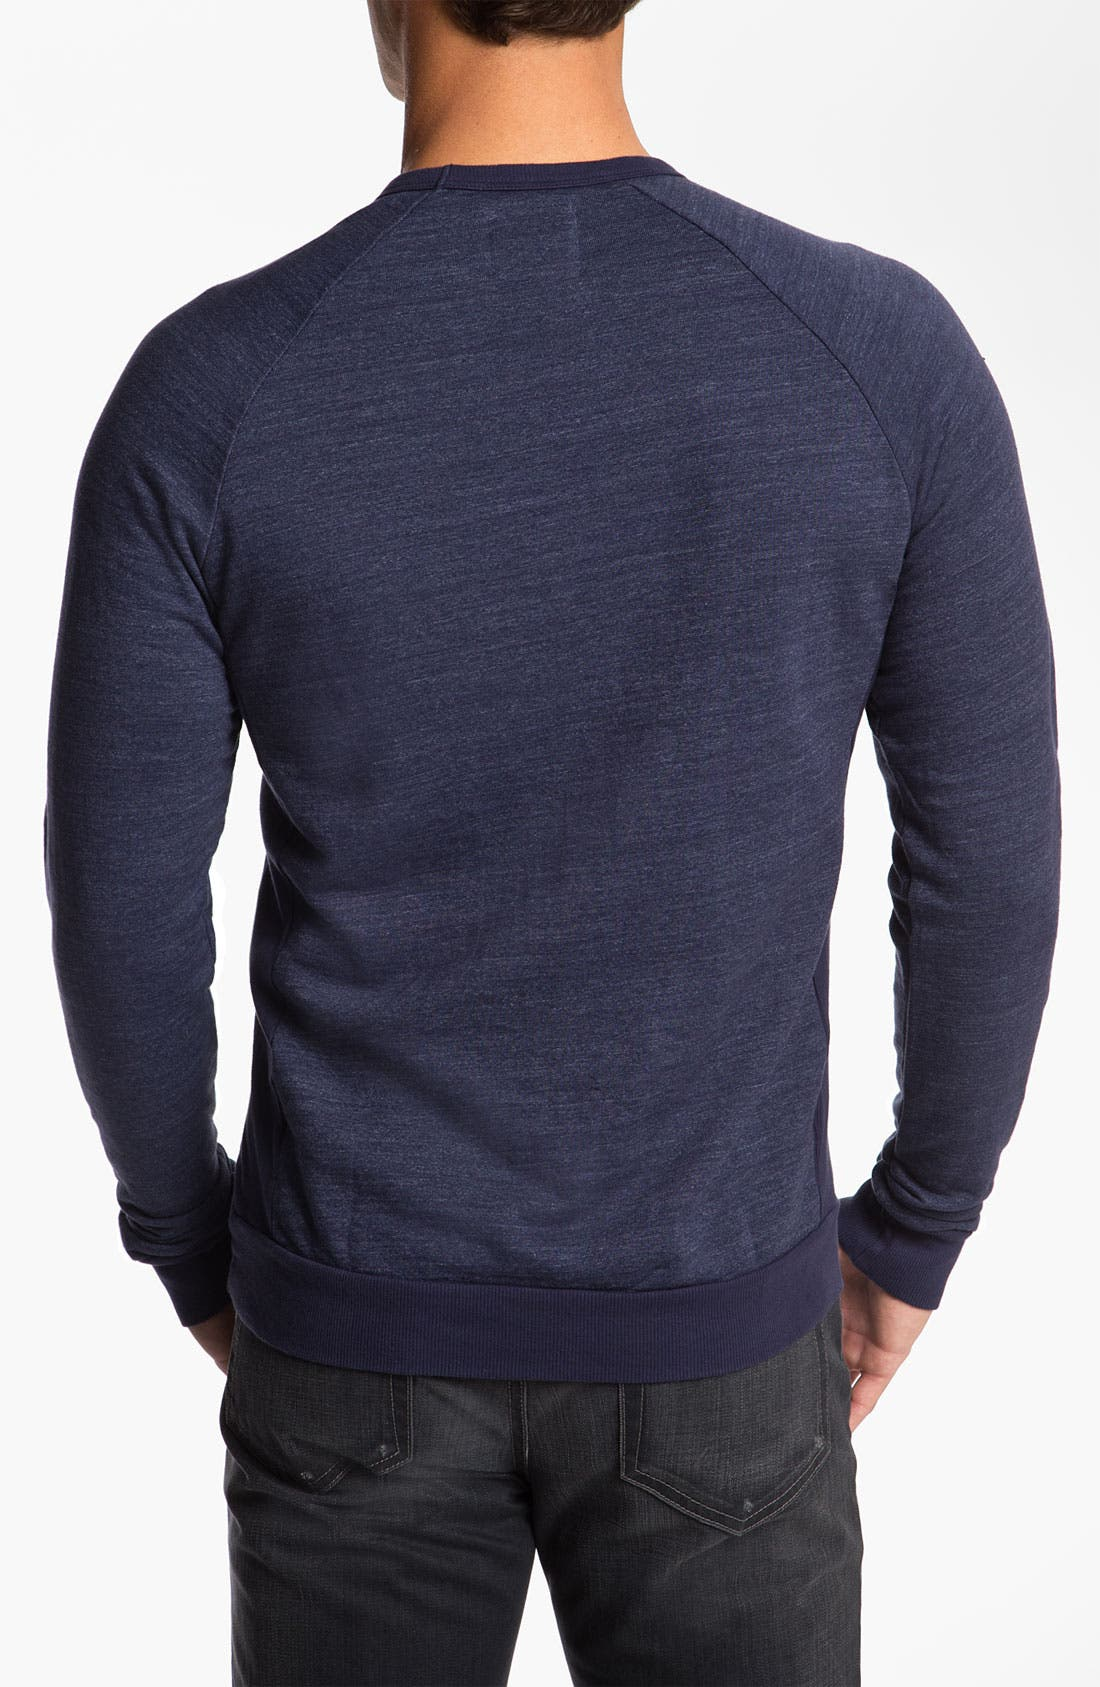 Alternate Image 2  - Splendid Mills 'Brody' Crewneck Sweatshirt